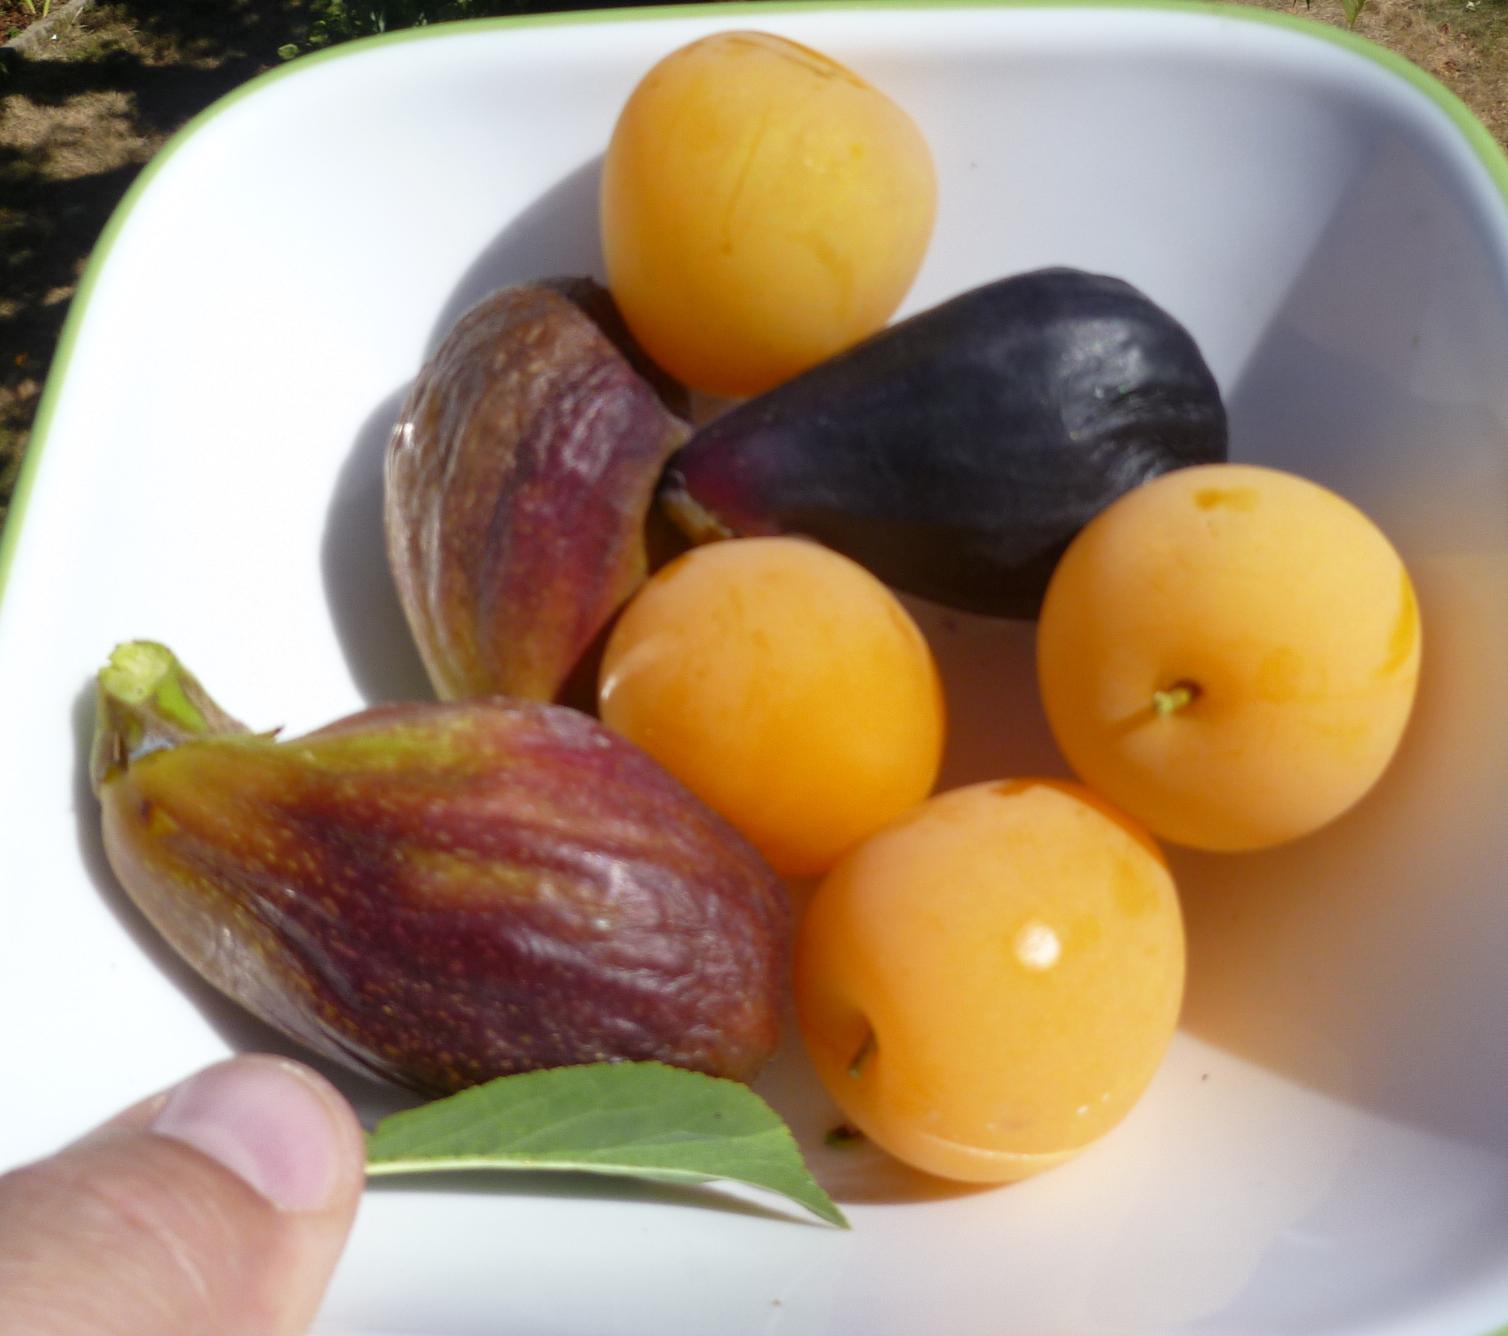 Growing Greener In The Pacific Northwest: Fresh Fruit